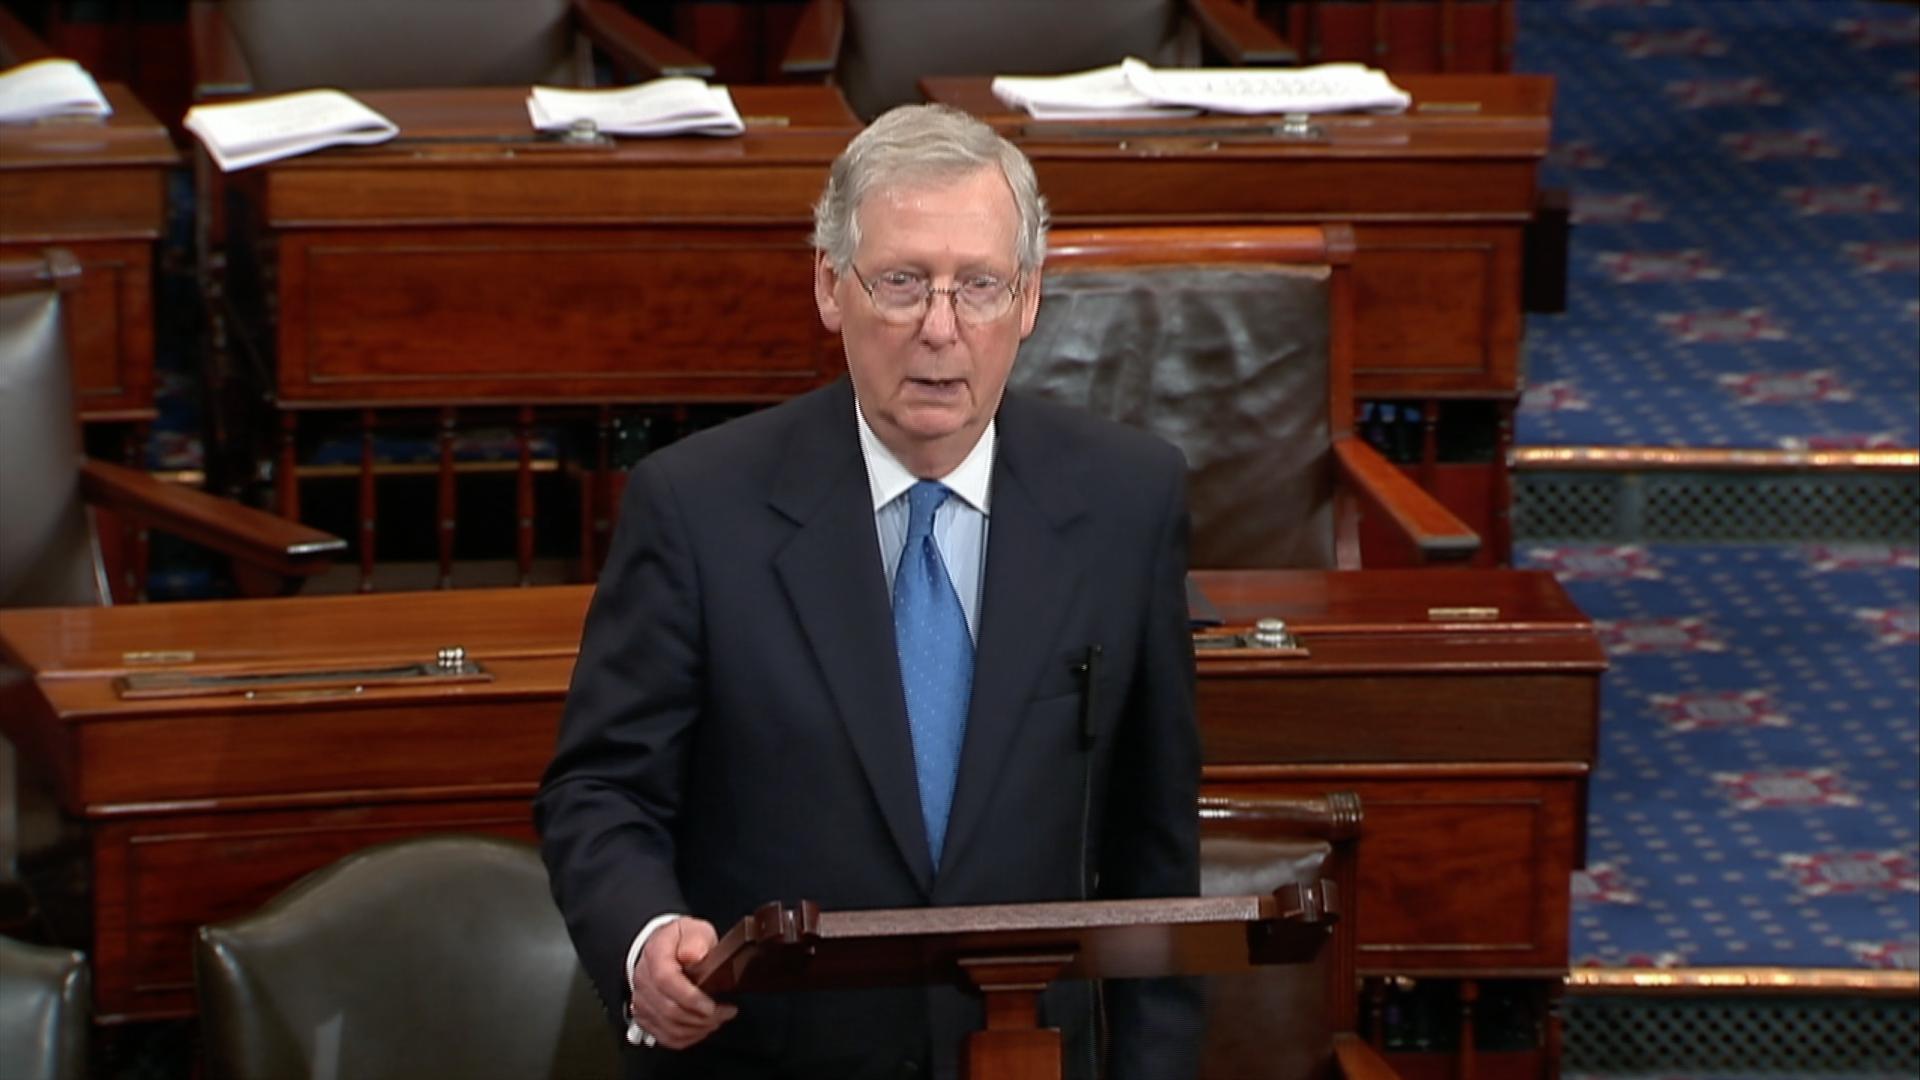 Senate approves budget in crucial step forward for Republican tax cuts